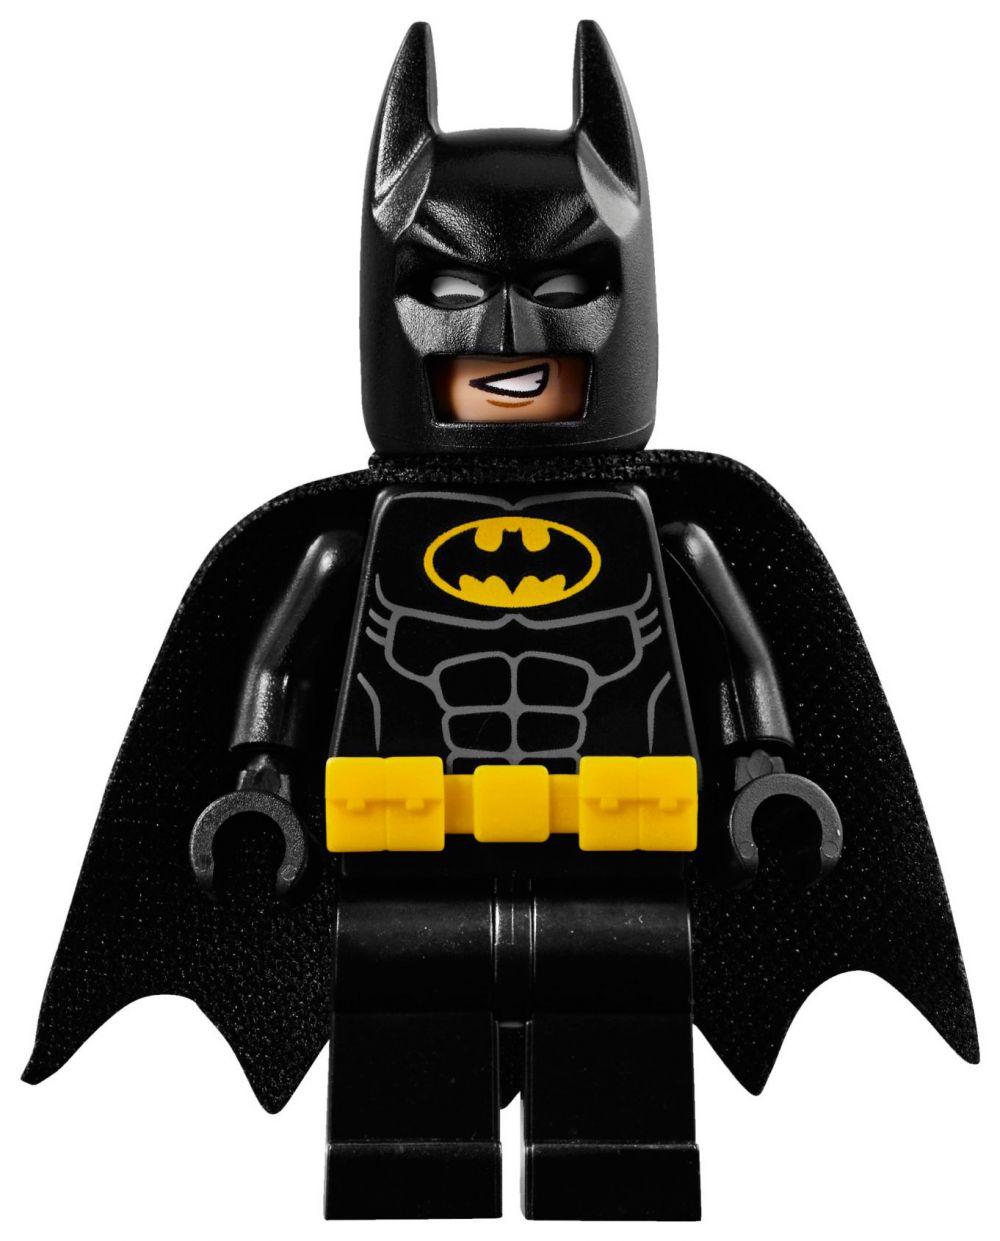 Lego the batman movie 853650 pas cher ensemble movie for Videos de lego batman